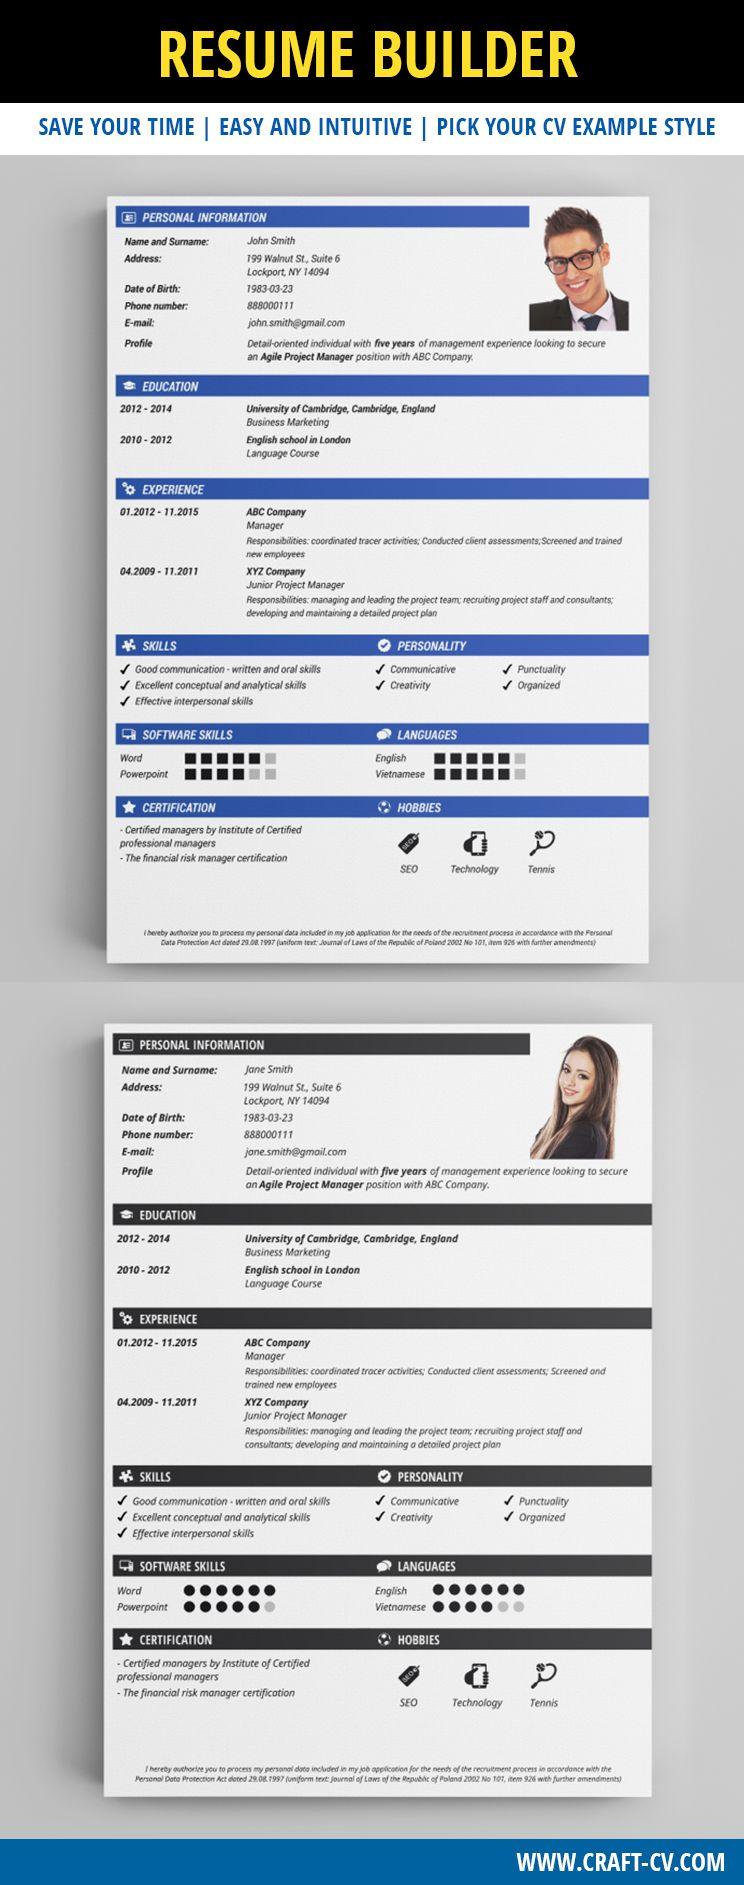 Professional cv templates resumetemplates resume